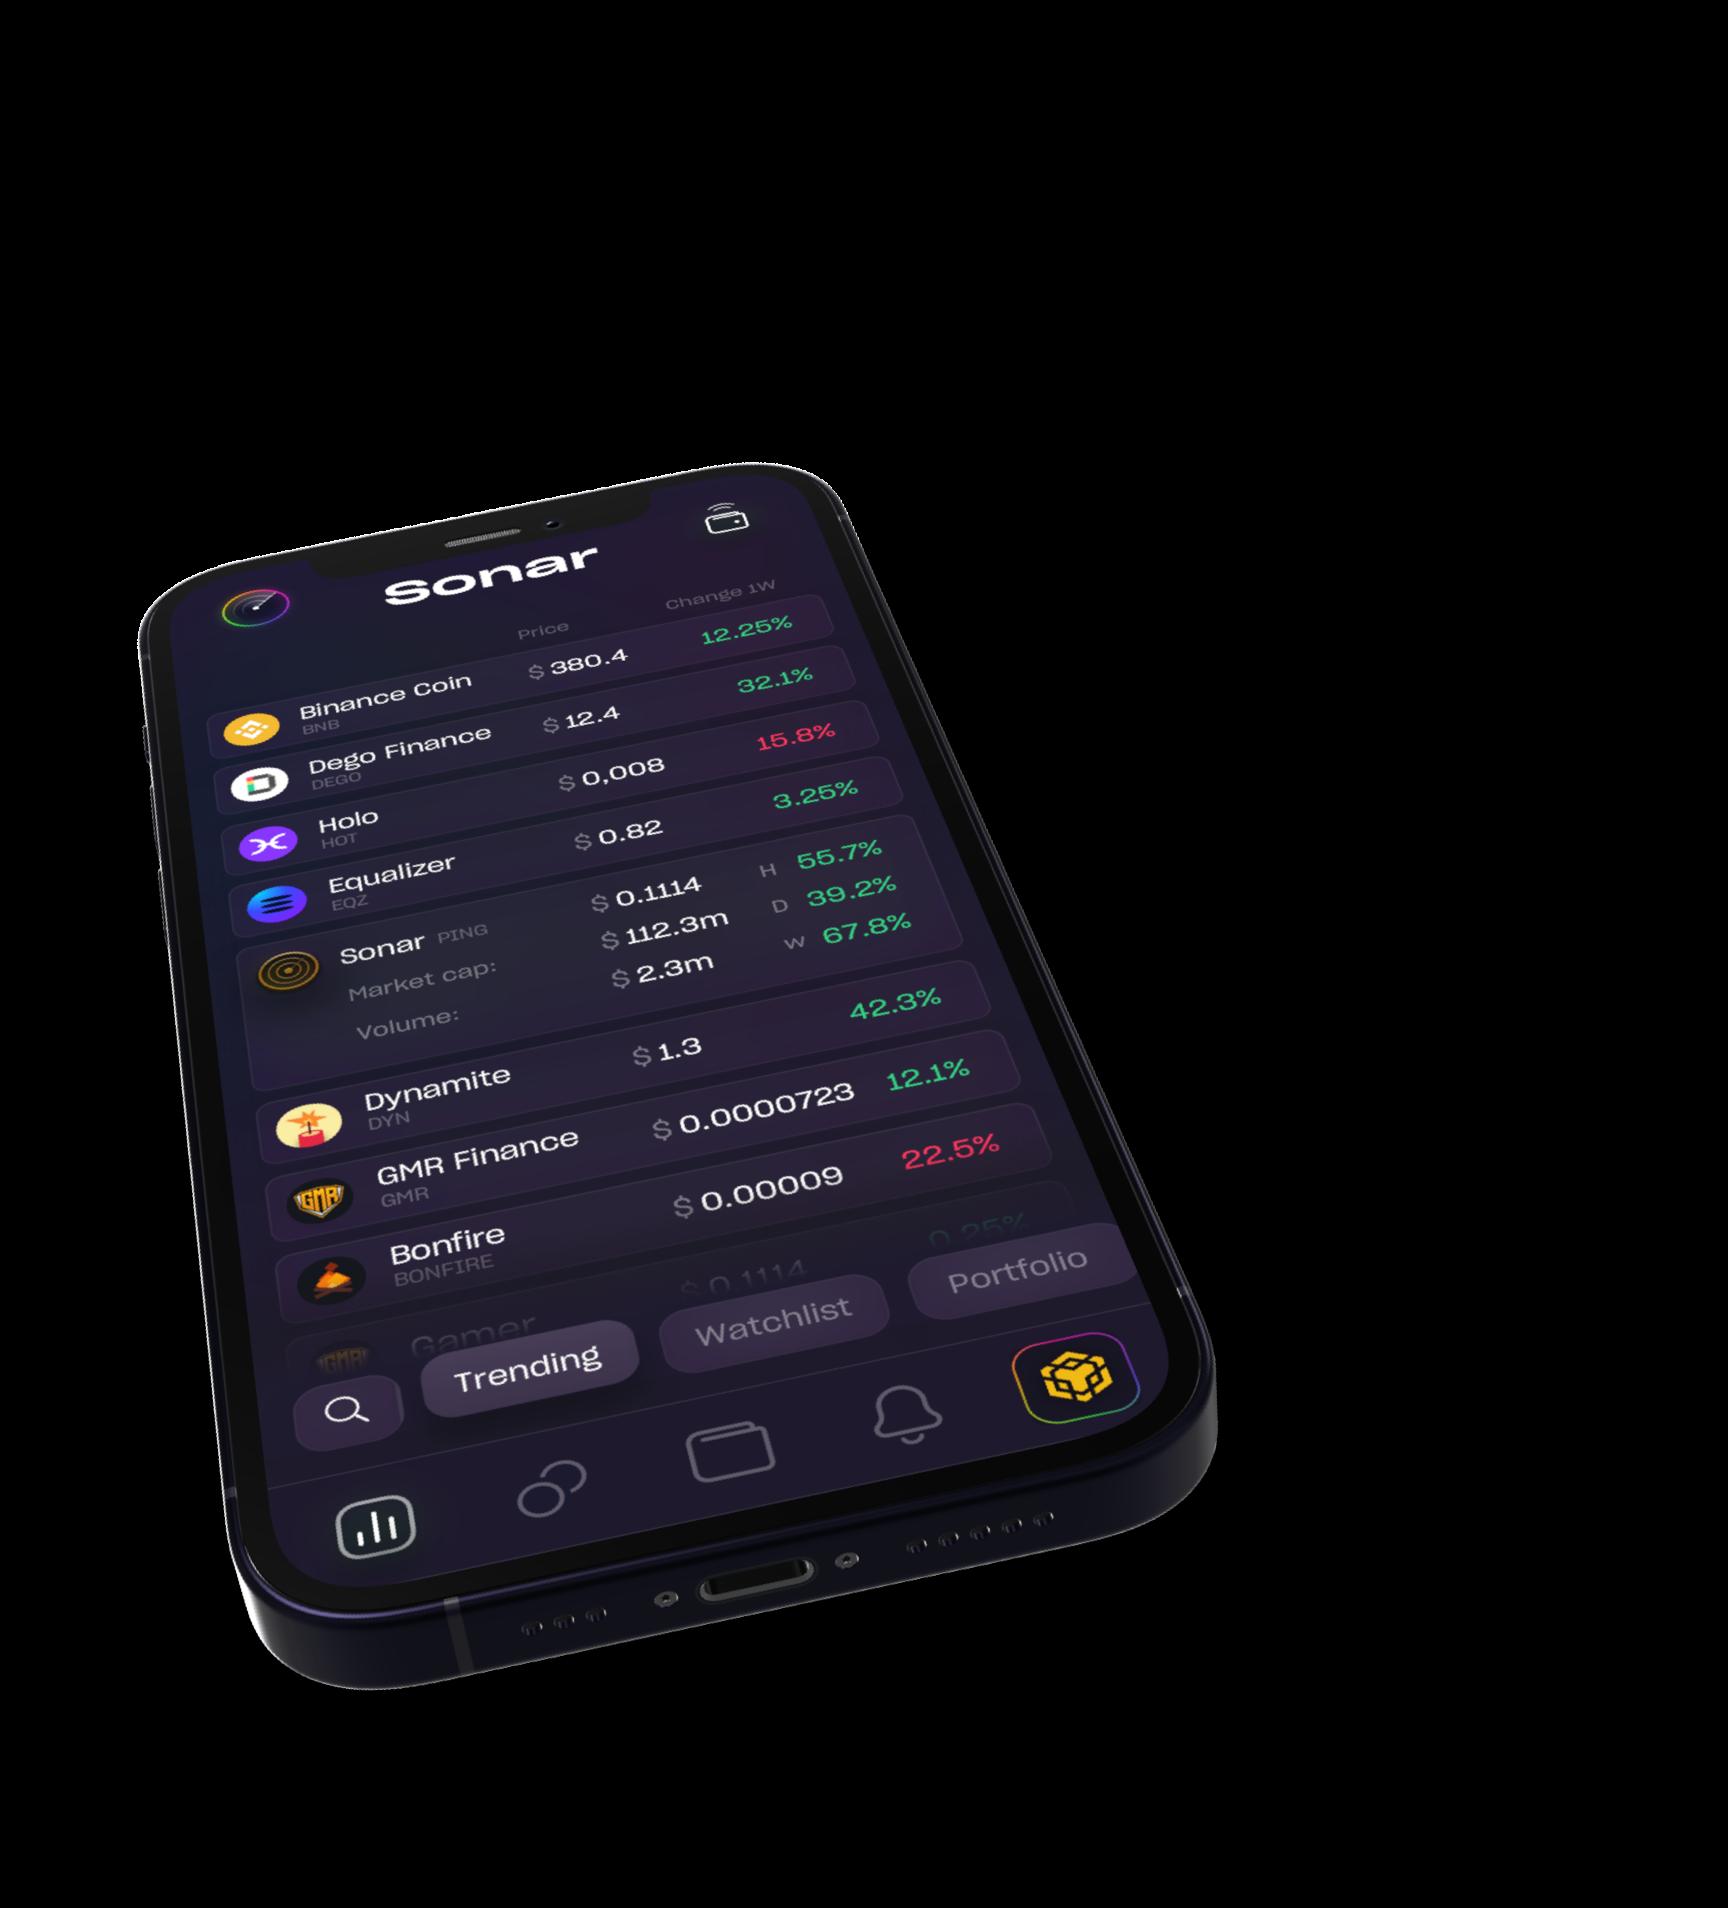 iPhone with Sonar platform screenshot